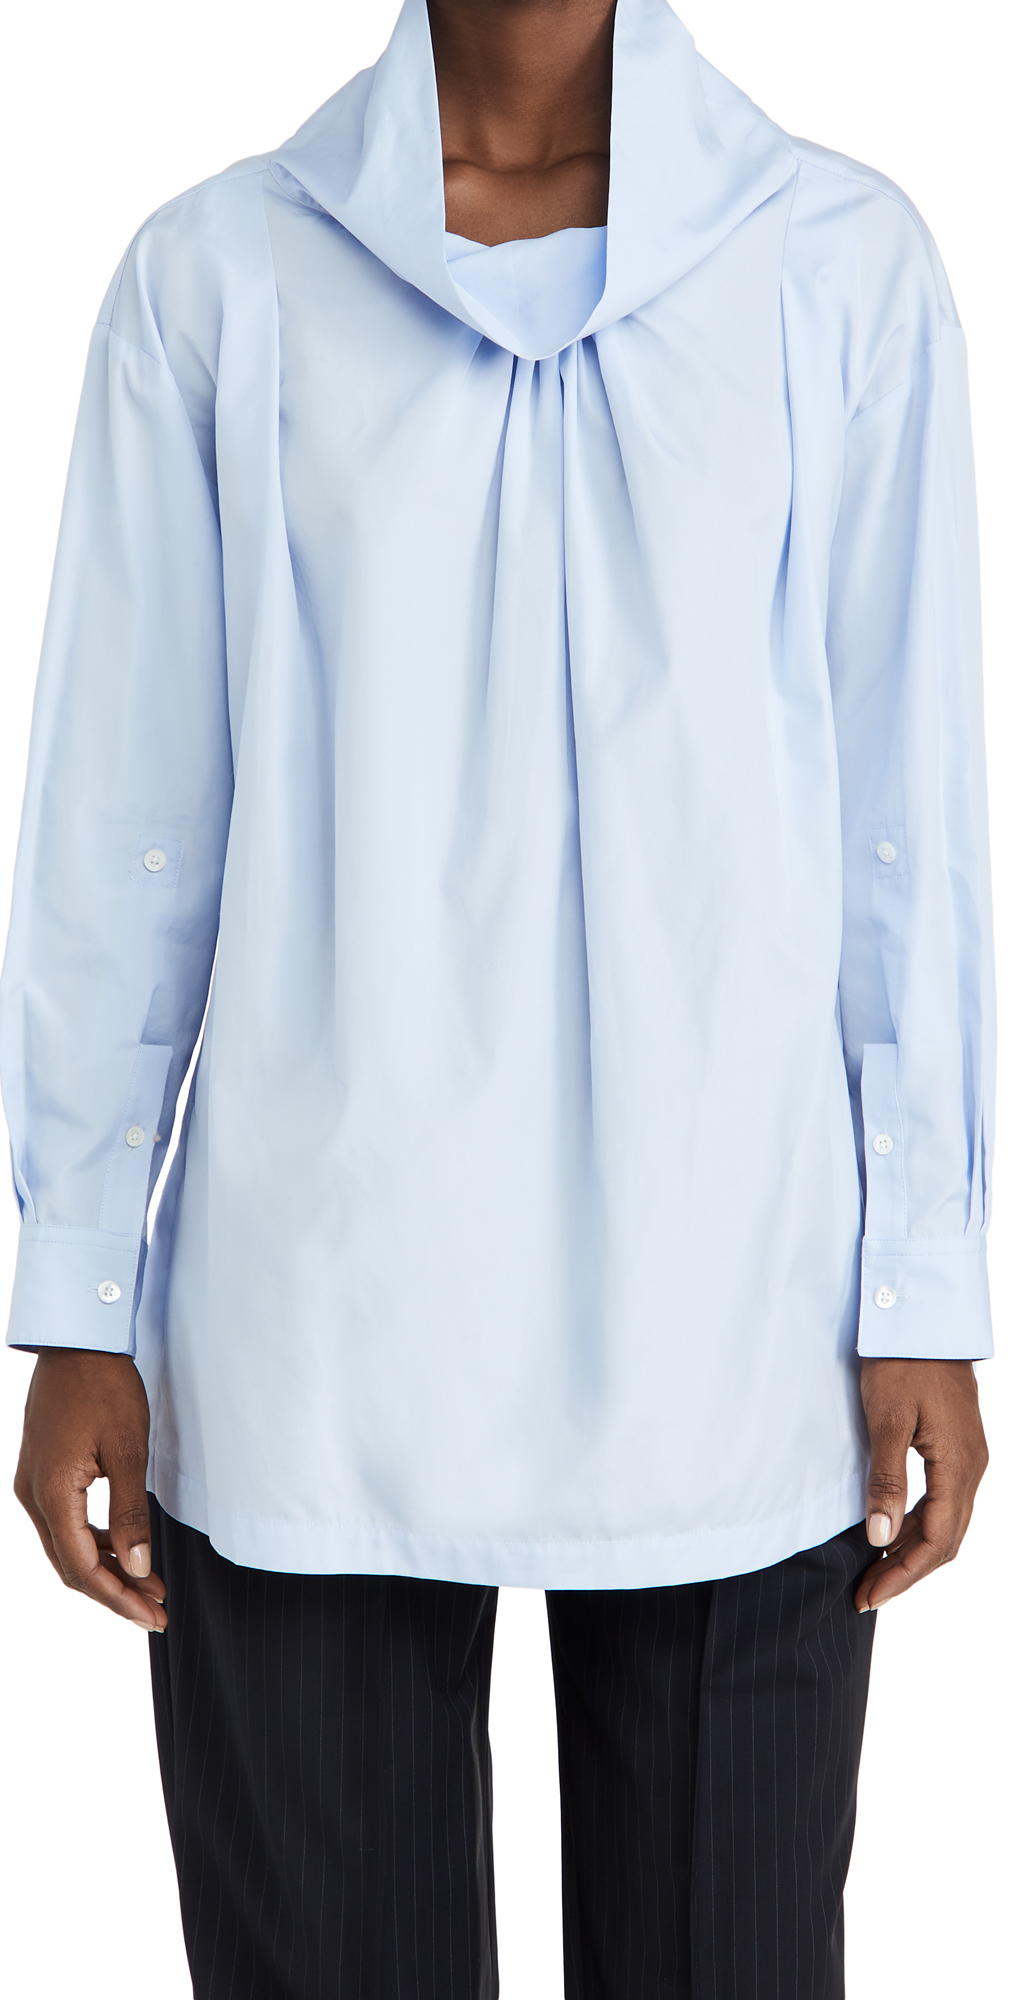 3.1 Phillip Lim Poplin Oversized Drape Collar Shirt